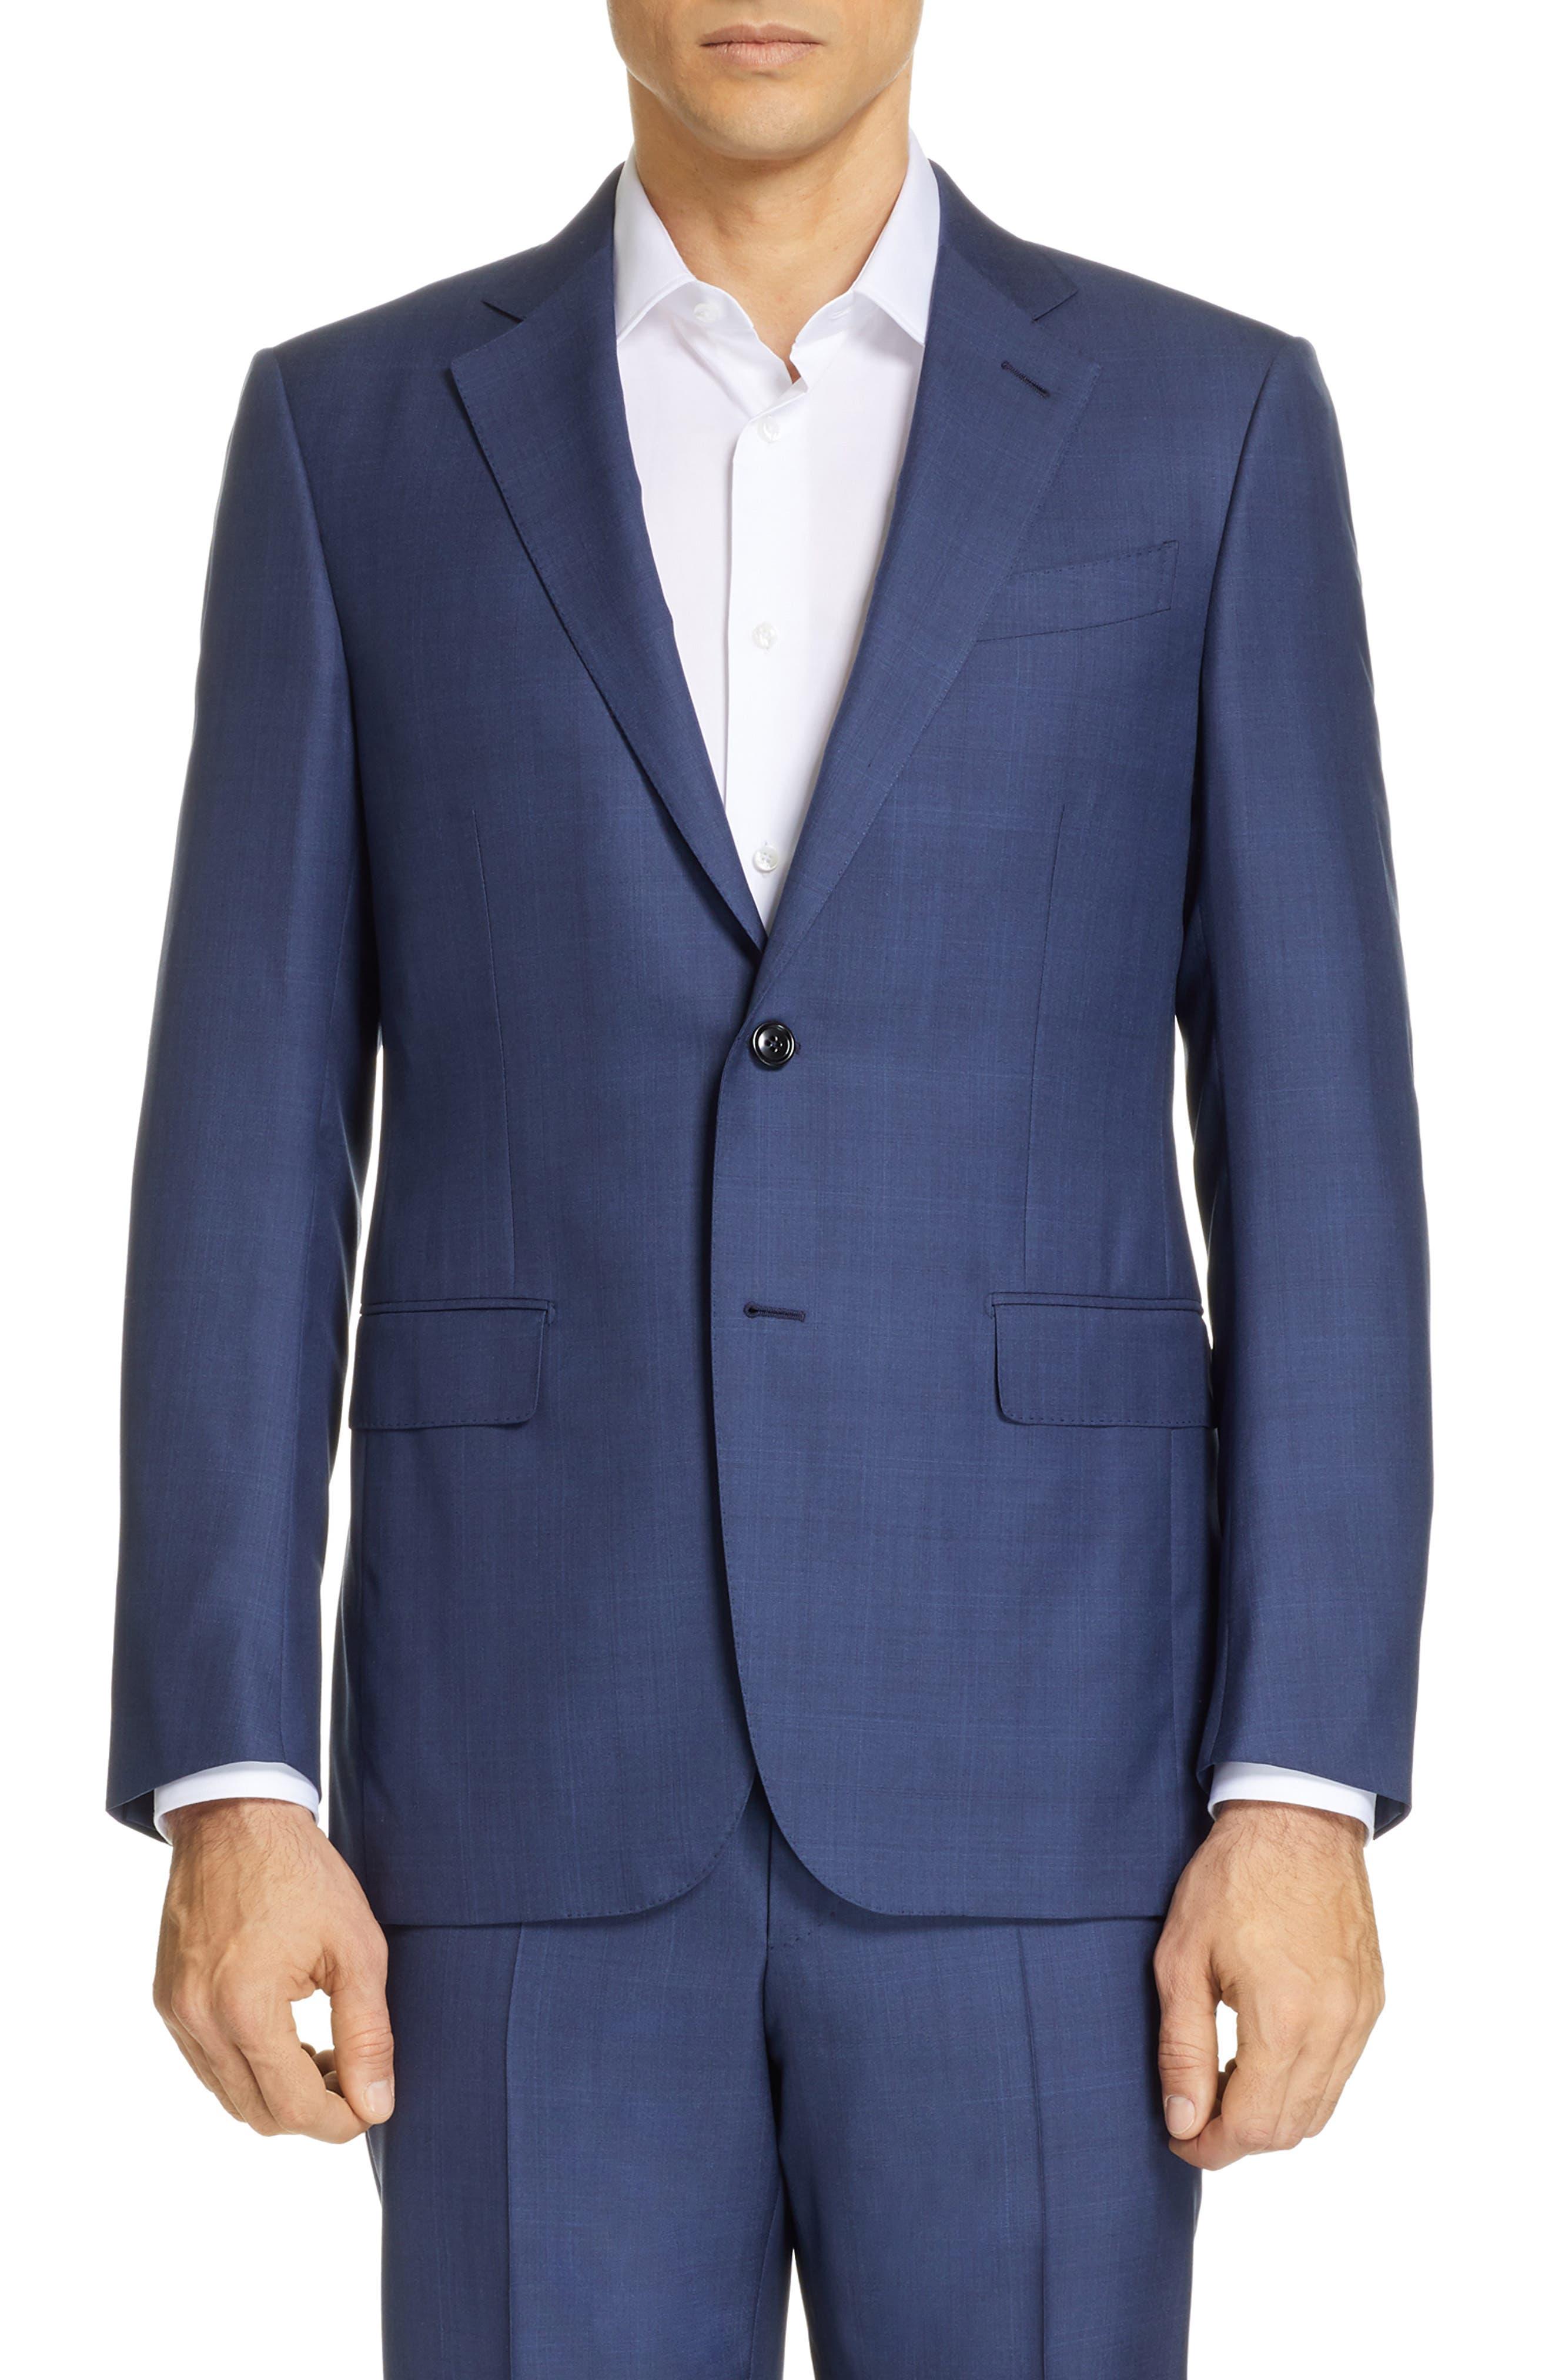 ERMENEGILDO ZEGNA, Trofeo Classic Fit Plaid Wool & Silk Suit, Alternate thumbnail 5, color, BLUE